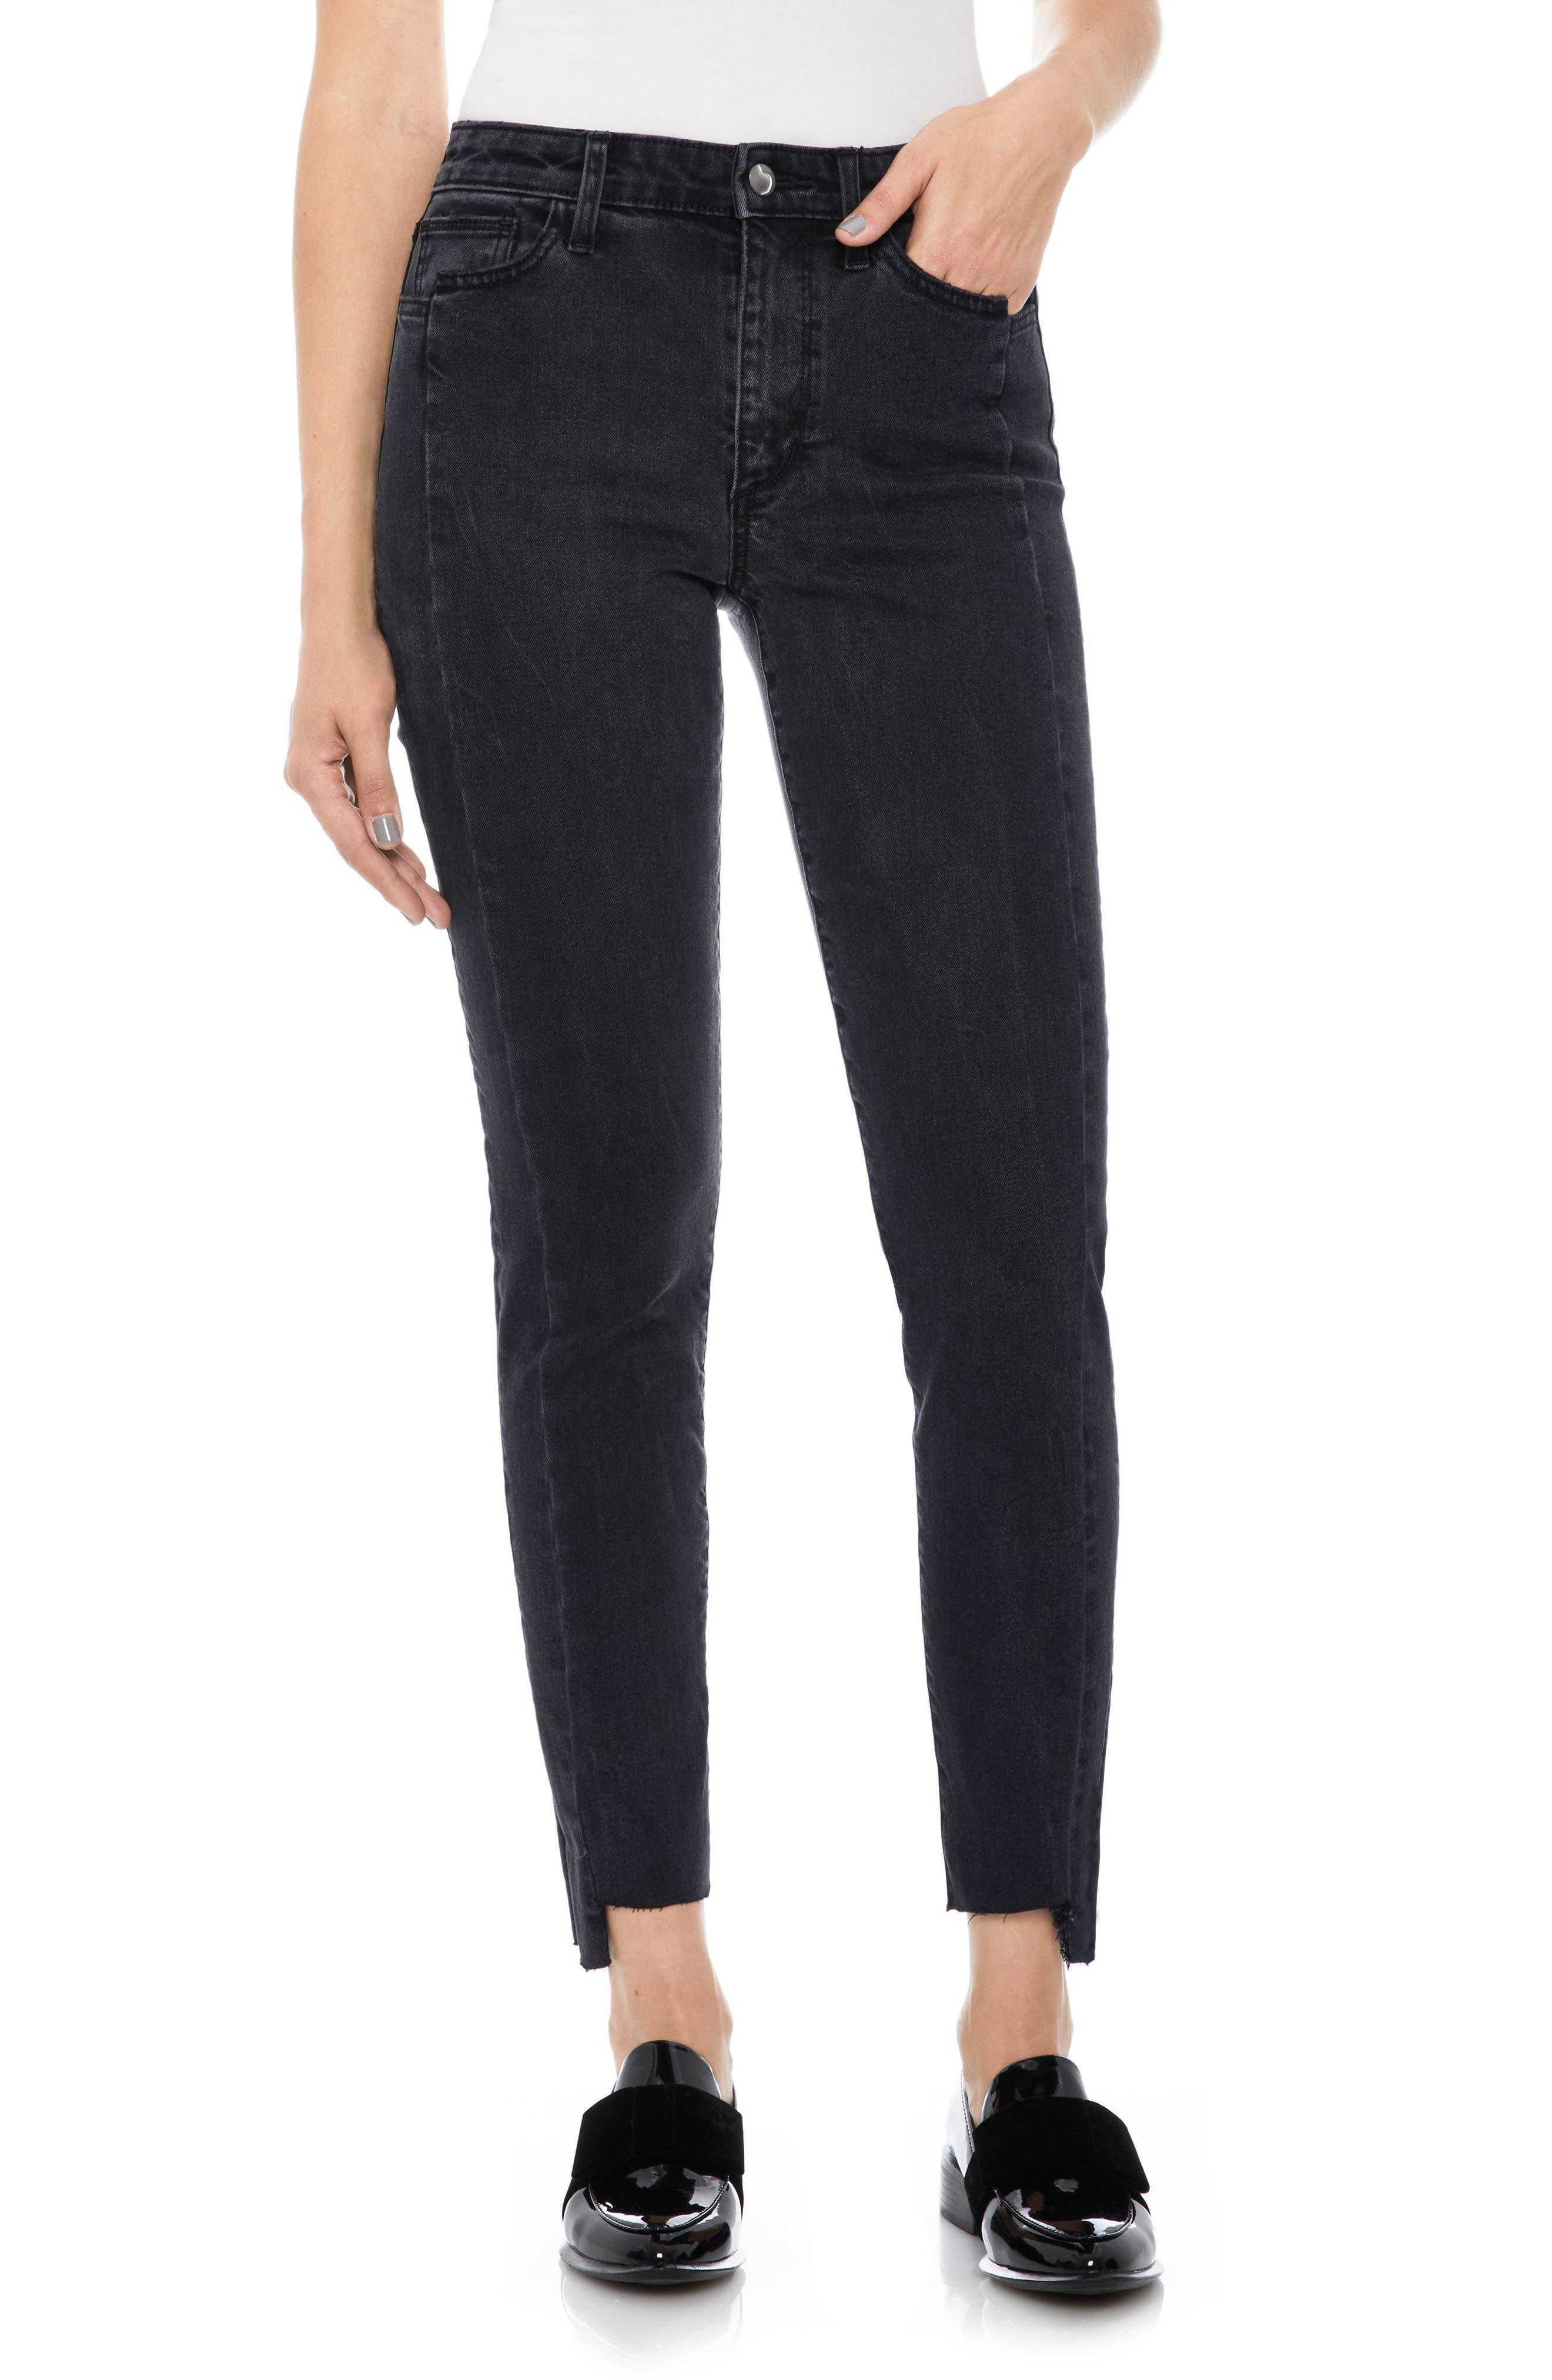 Taylor Hill x Joe's Kass Raw Step Hem Ankle Skinny Jeans,                             Main thumbnail 1, color,                             011